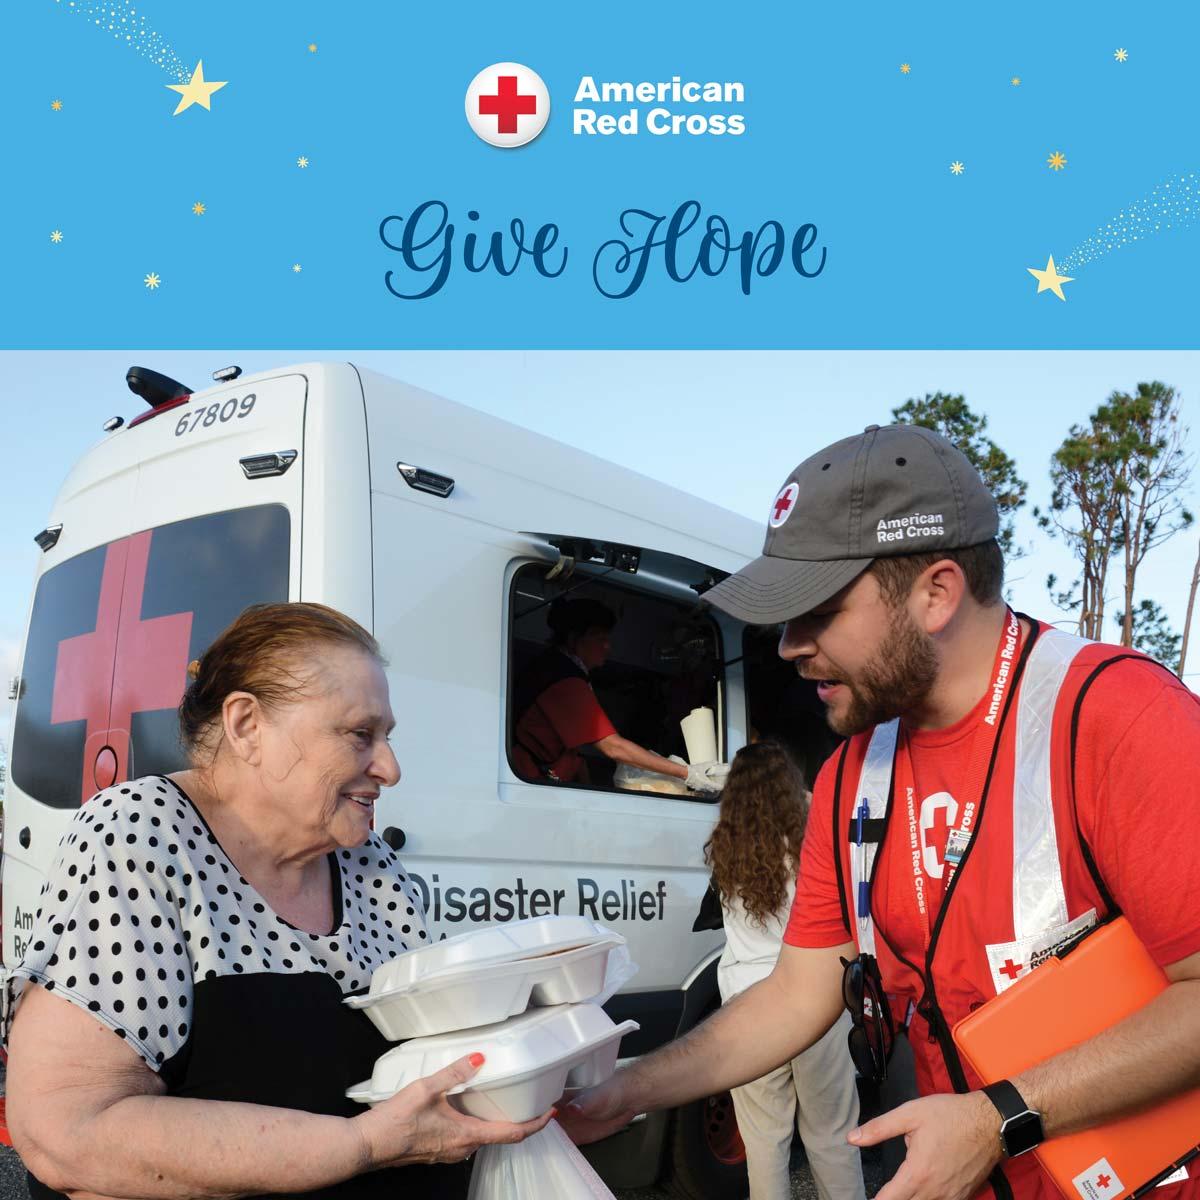 give-hope-fb